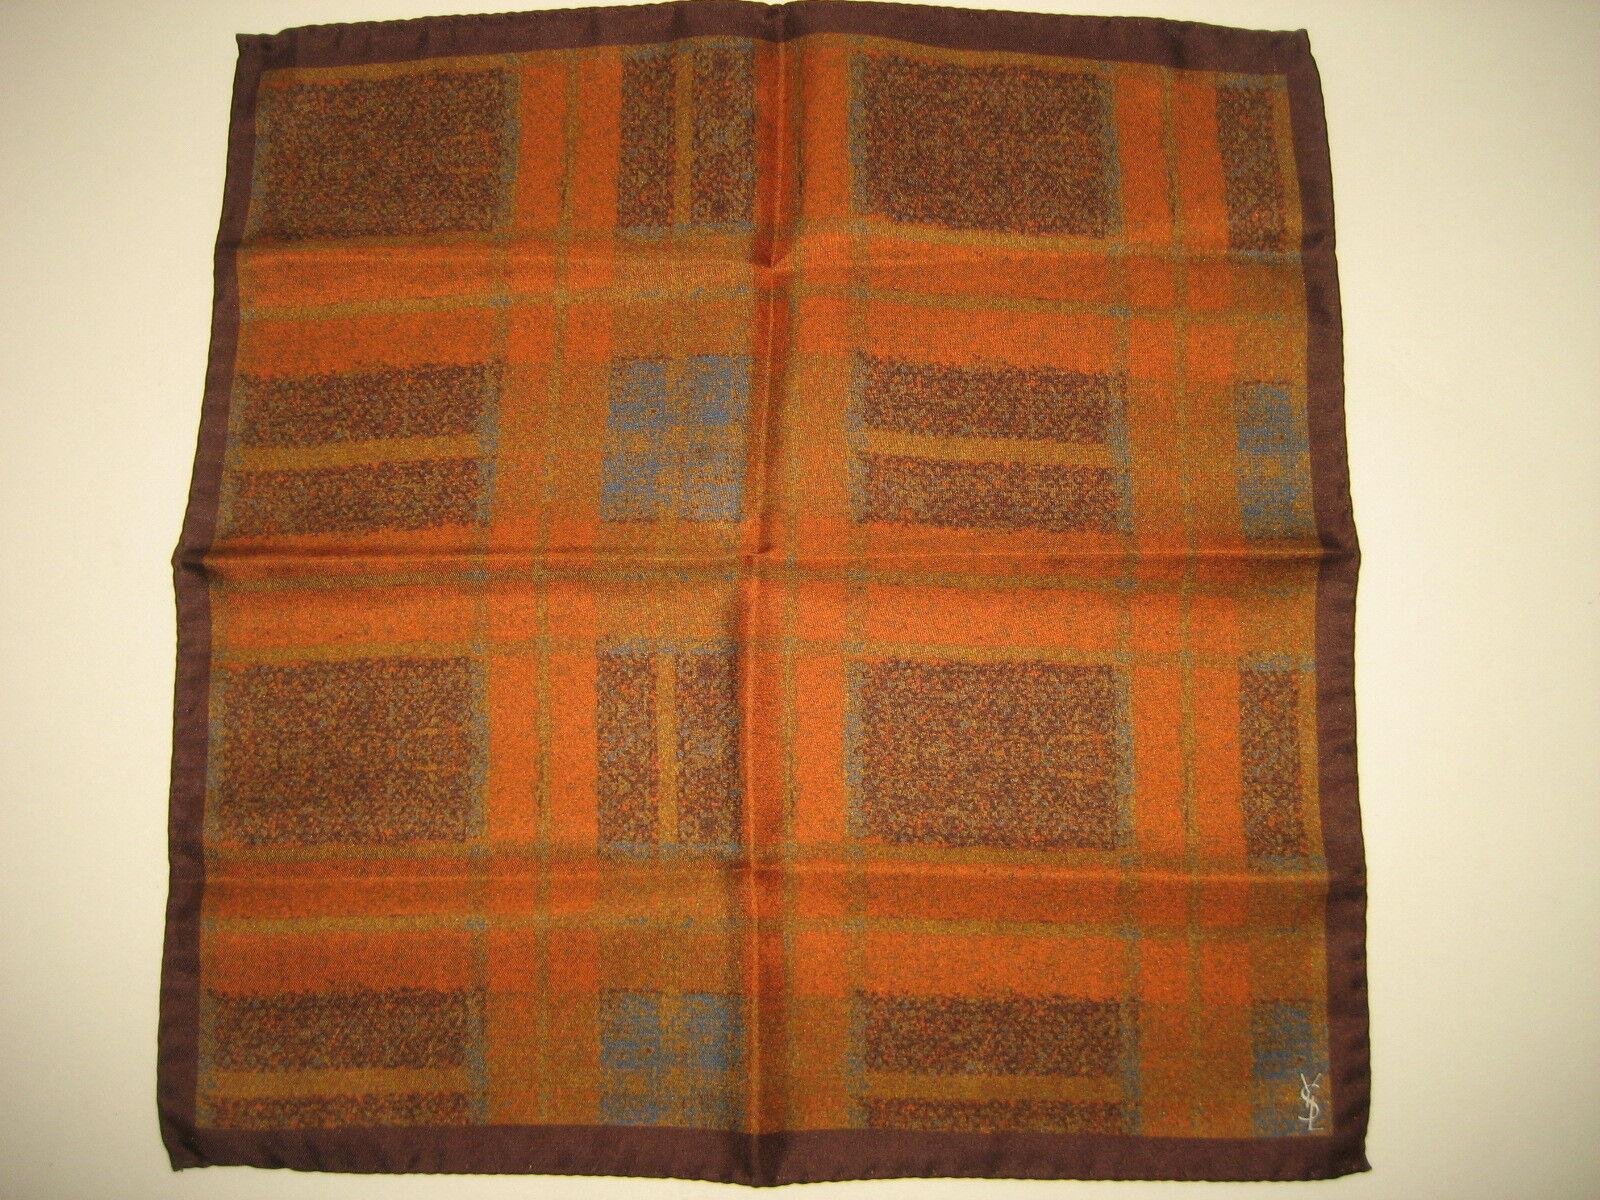 NEW Yves Saint Laurent YSL Orange/Brown Silk Handkerchief Pocket Square 13